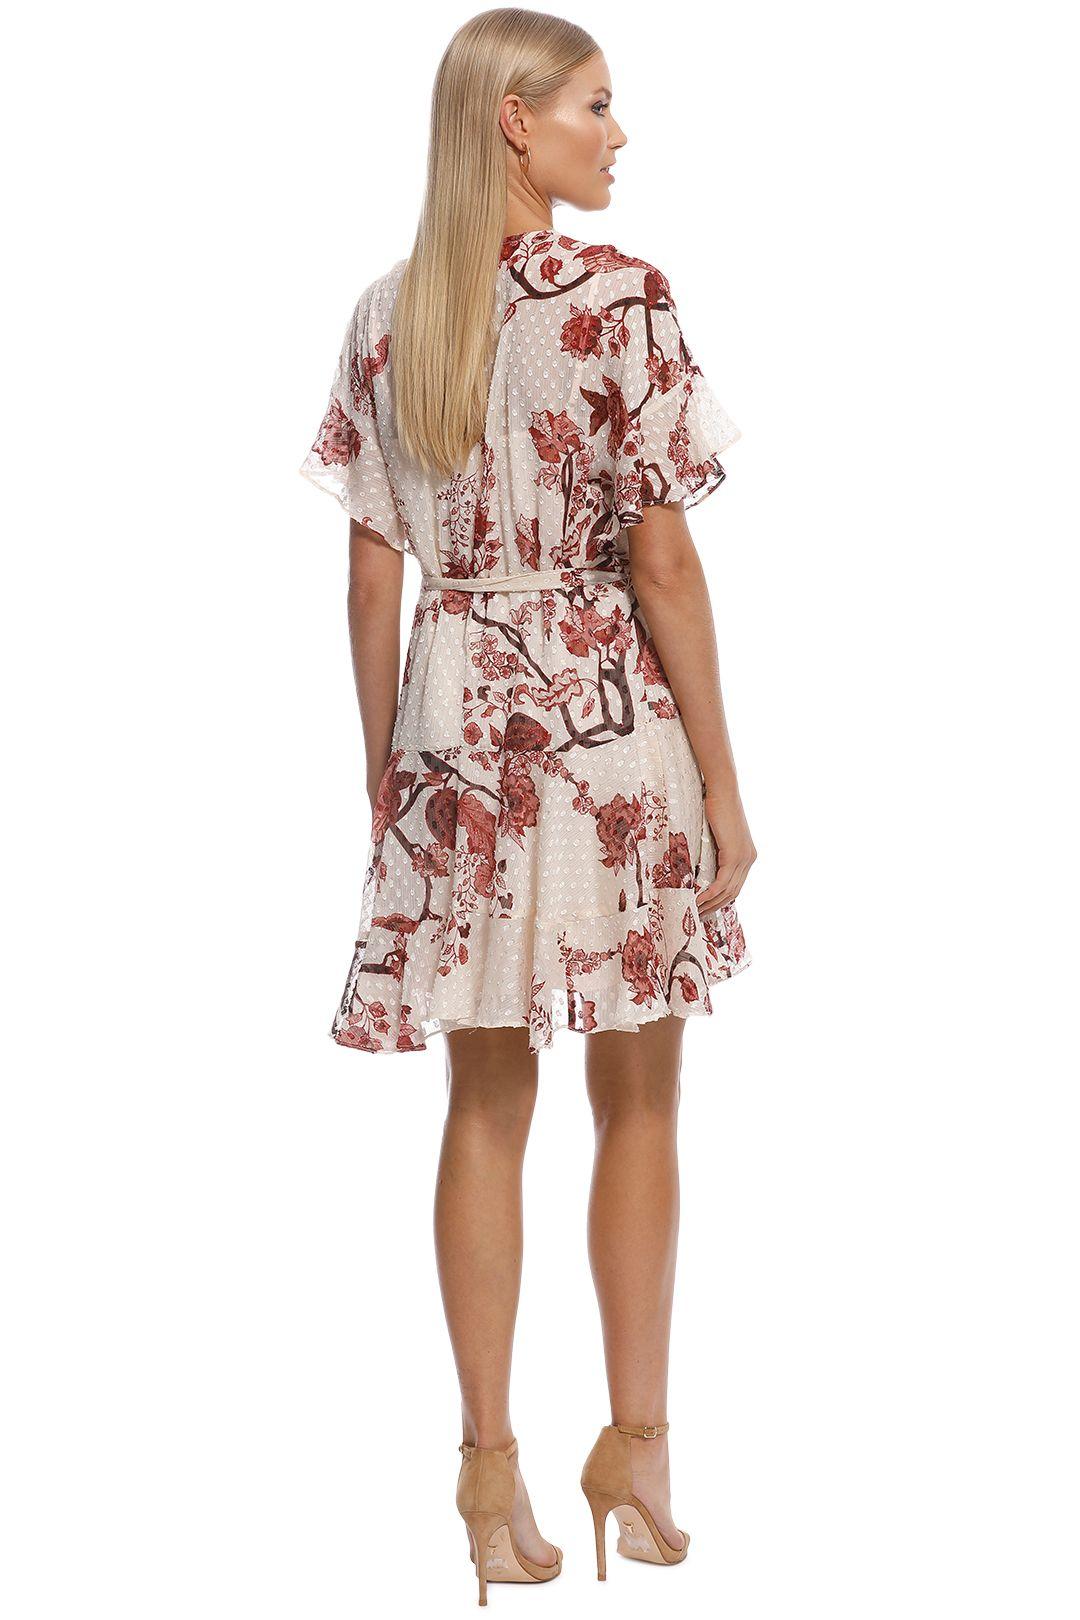 Rodeo Show - Carmel Mini Dress - Brown - Back